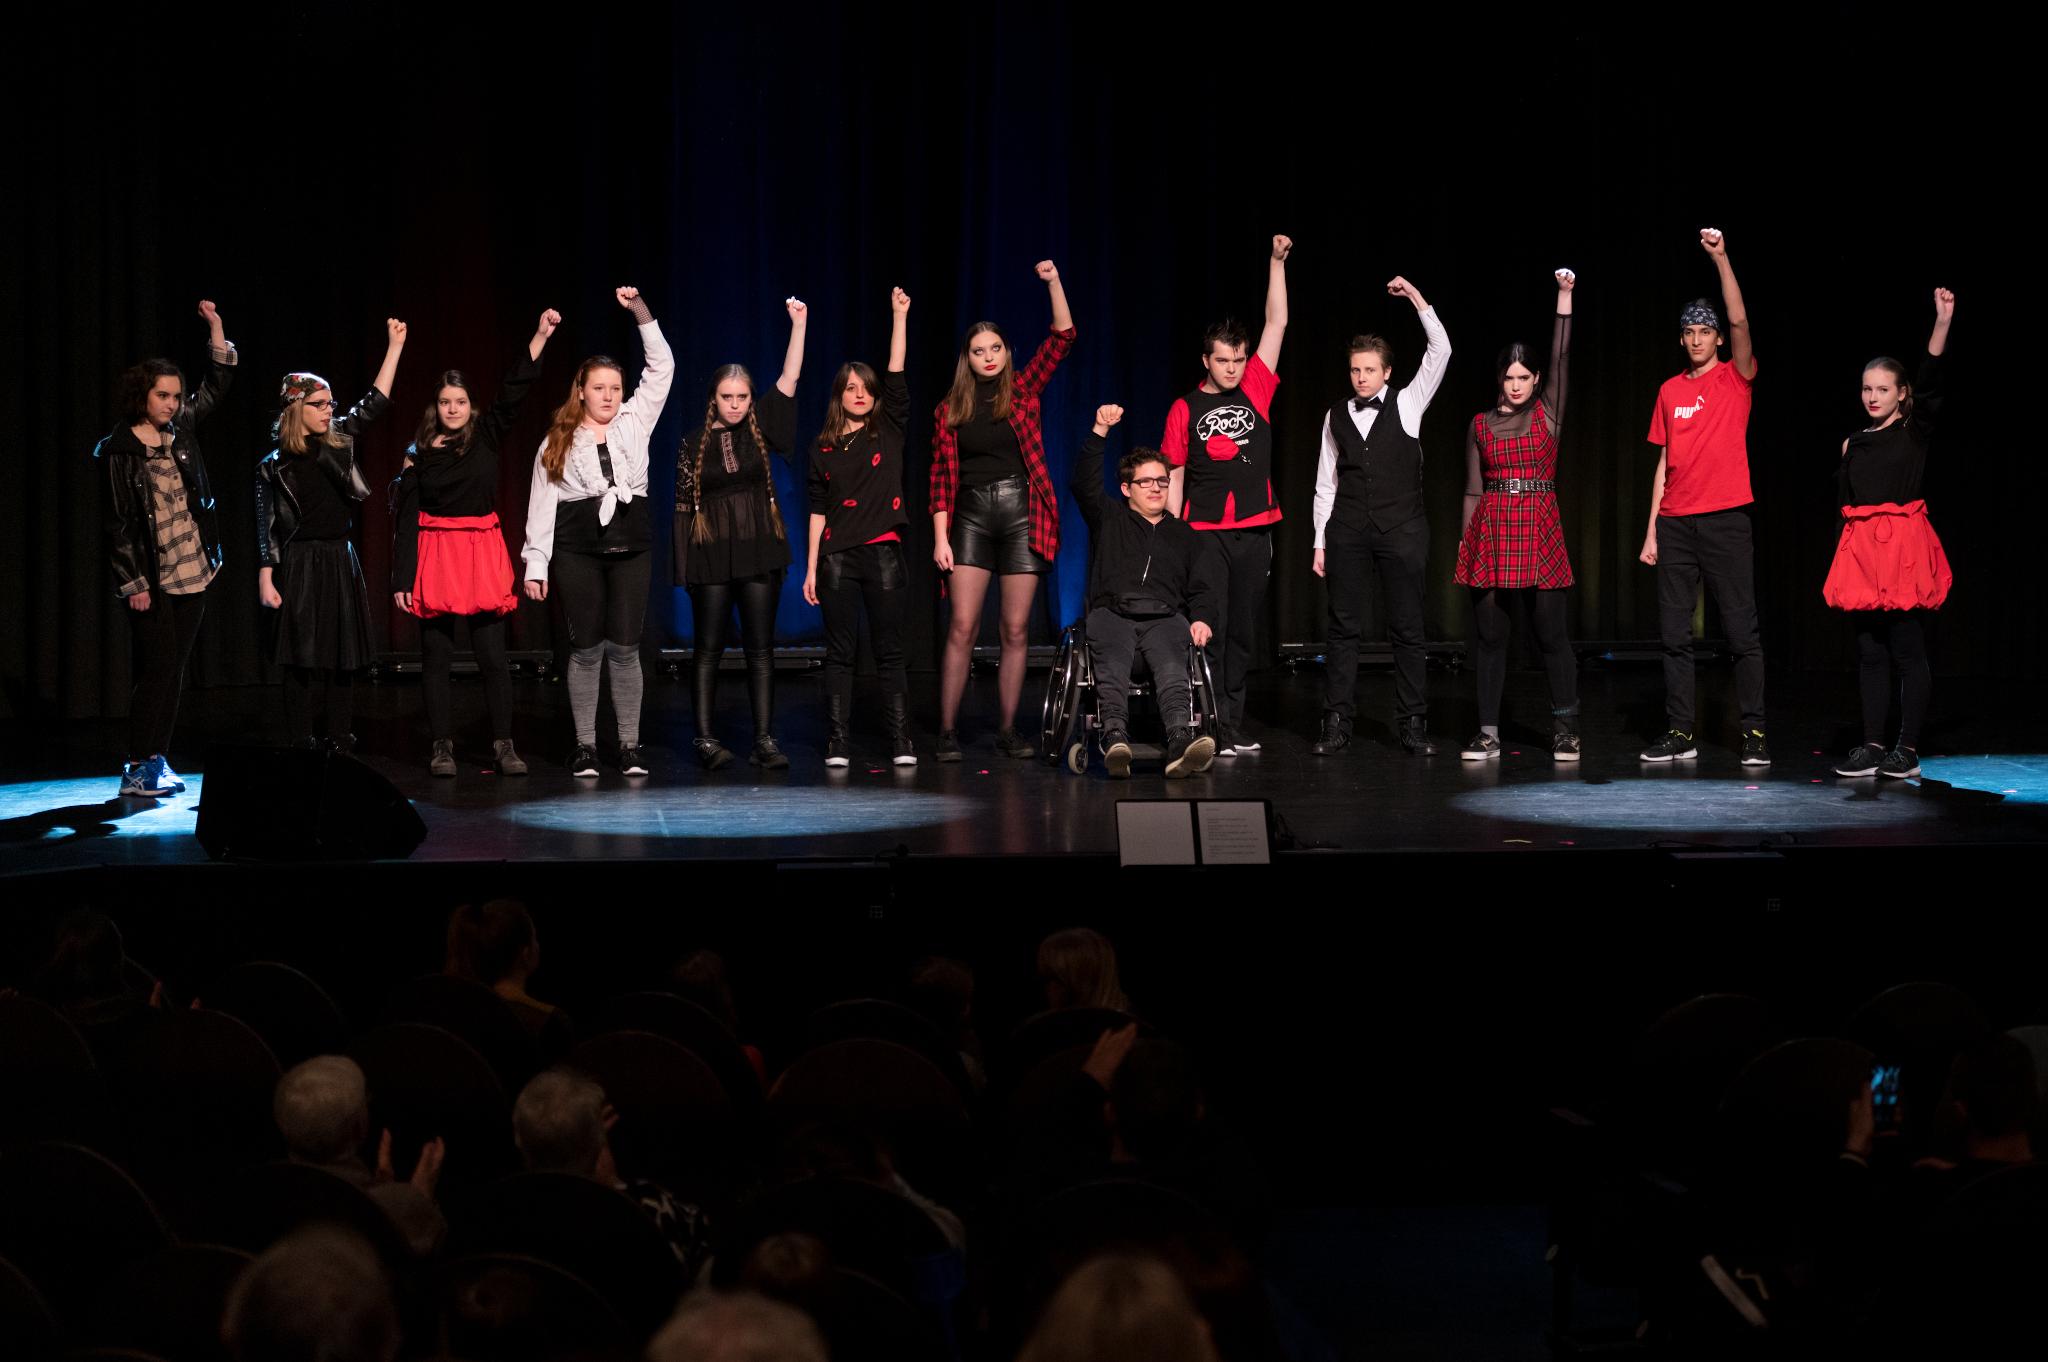 jugendkulturjahr-2020-ratingen-jkj2020-YouthDay-ActingClassLUX